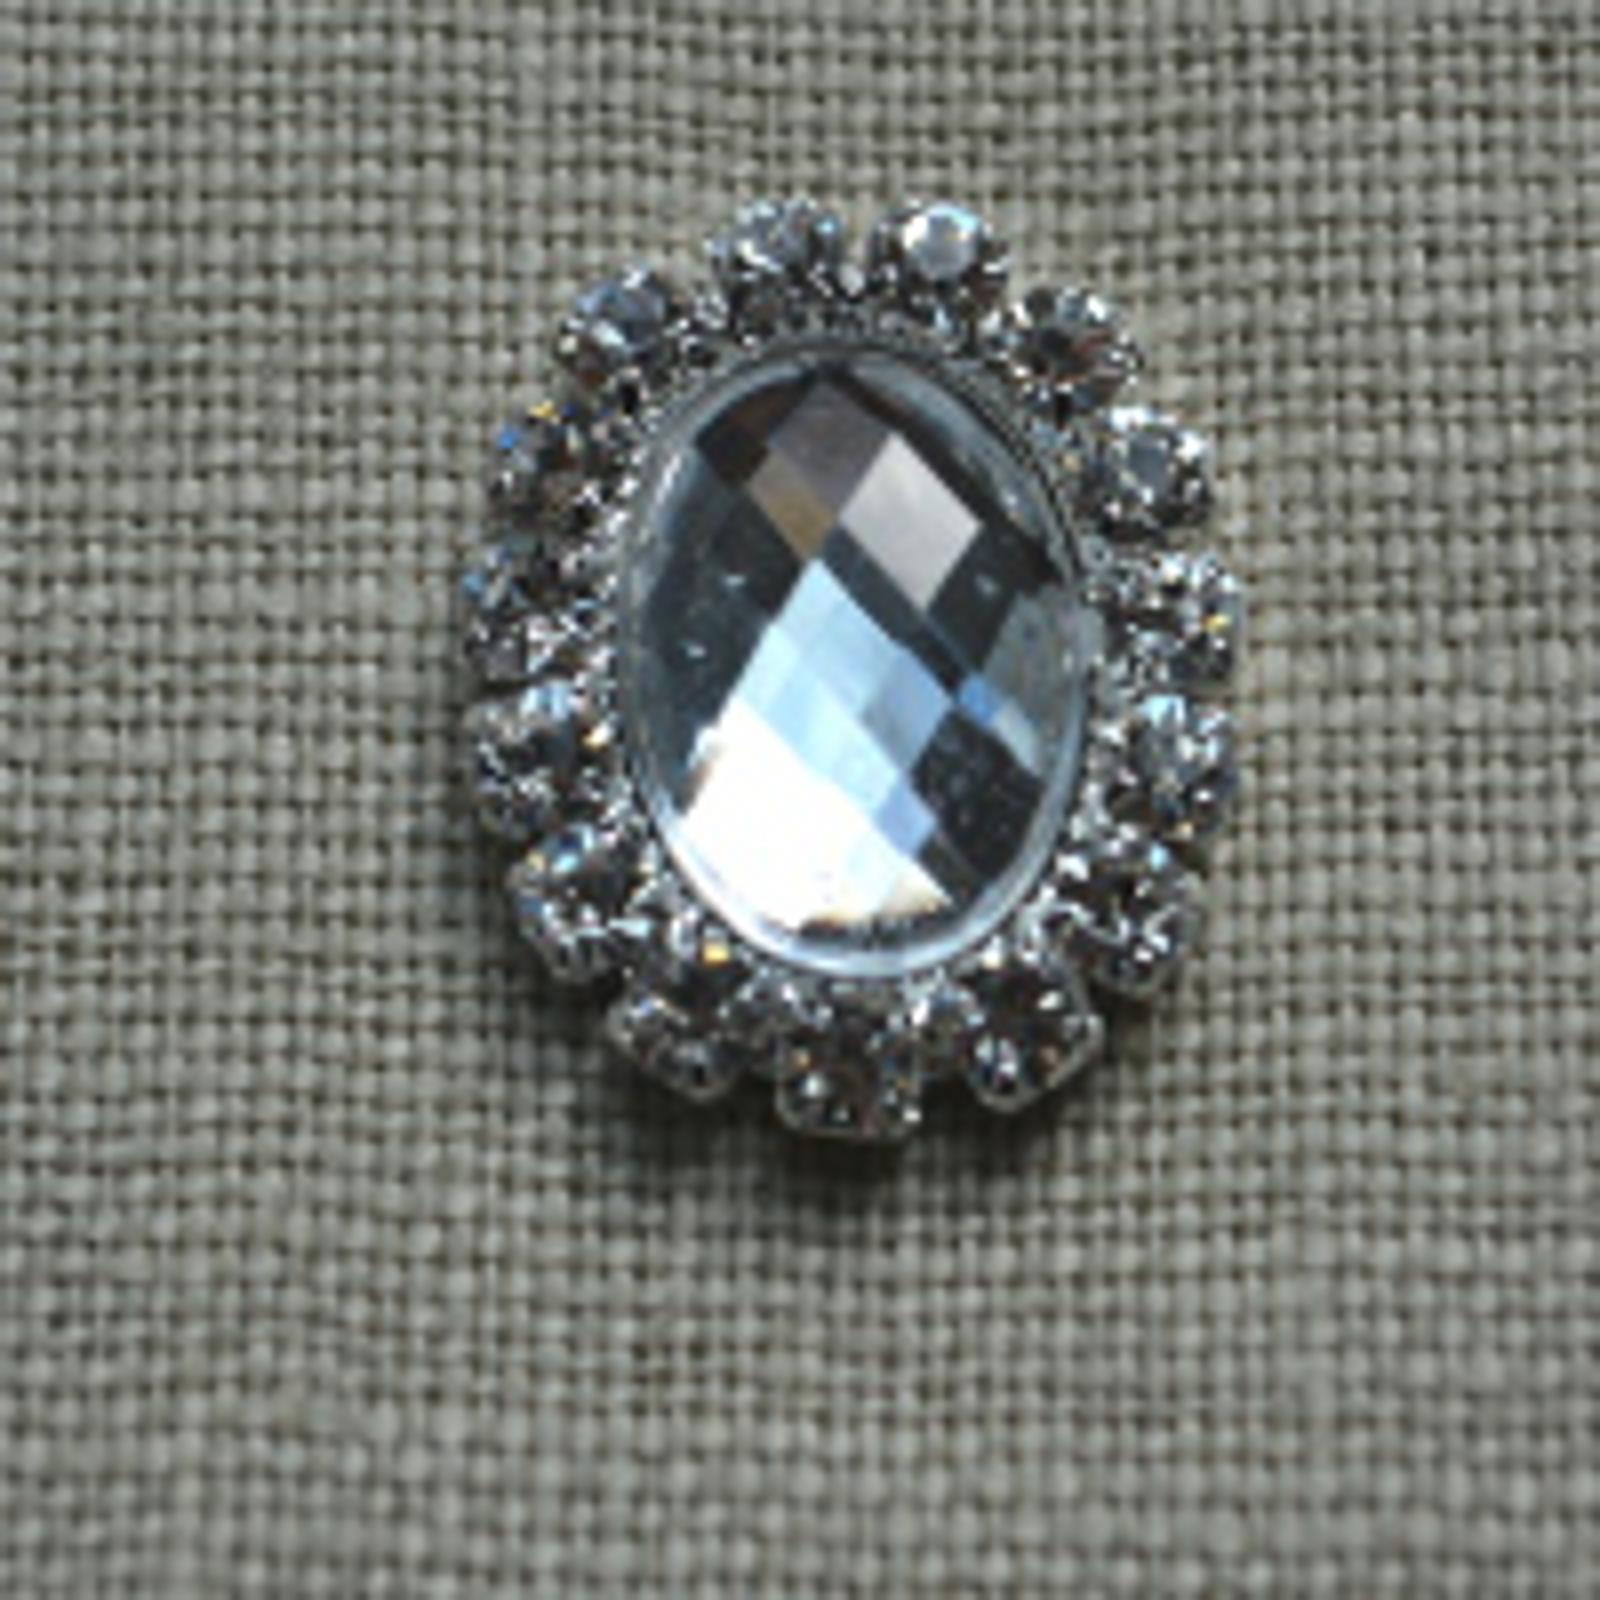 Diamante And Pearl Wedding Embellishment For DIY Invitations